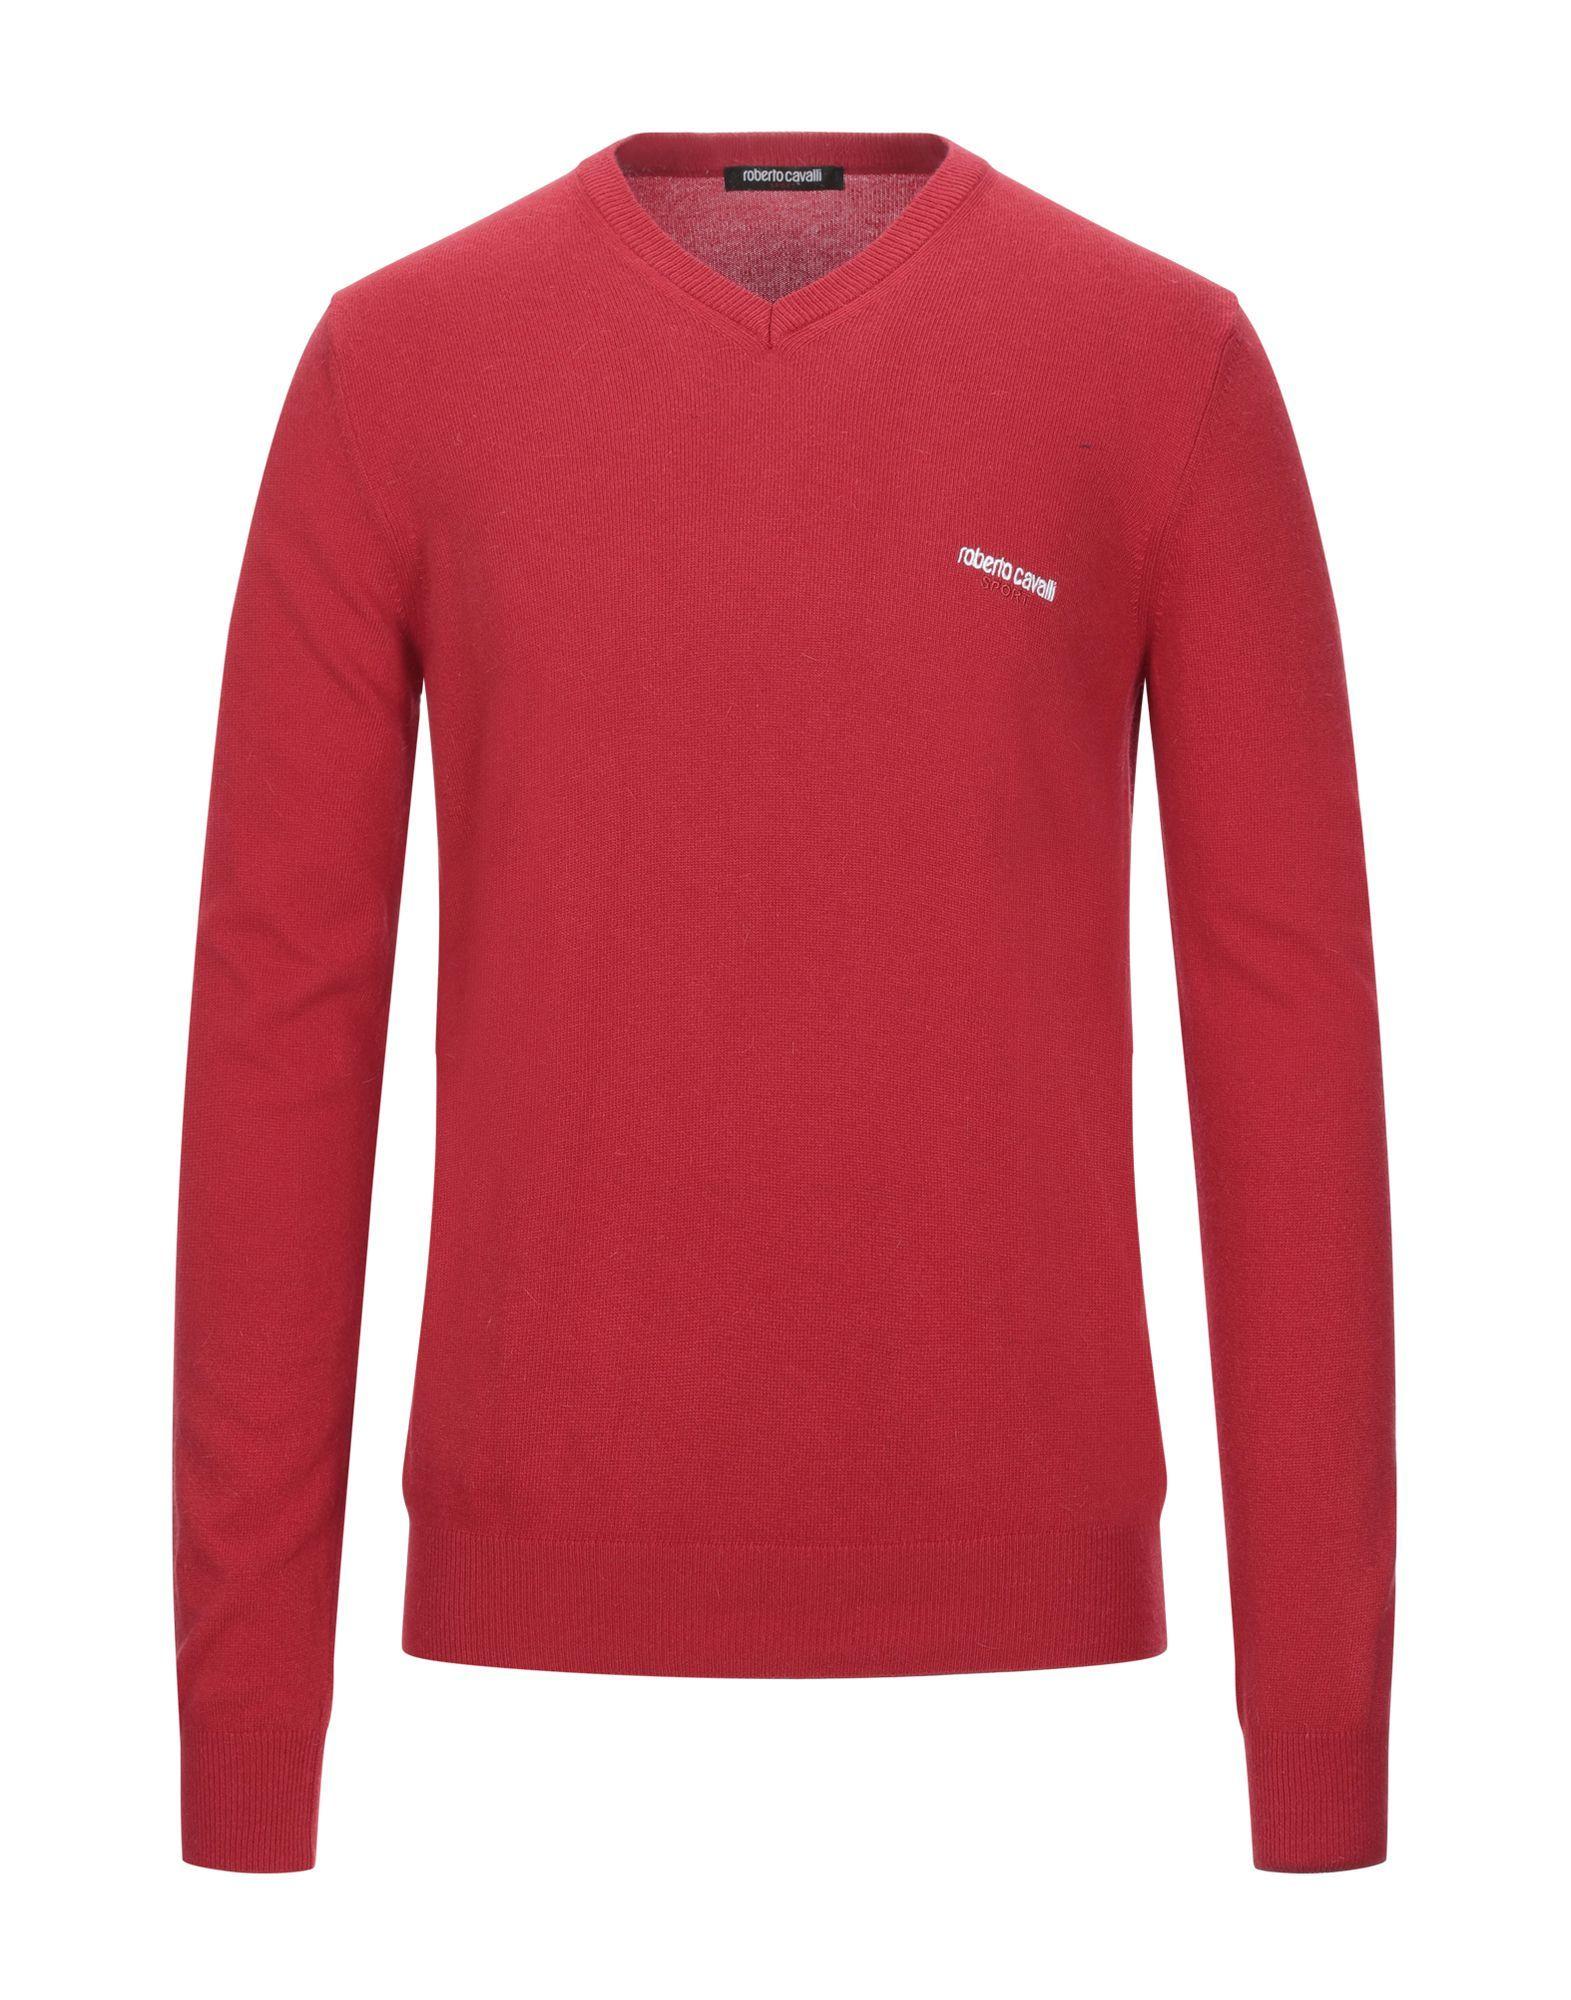 Roberto Cavalli Sport Red Jumper